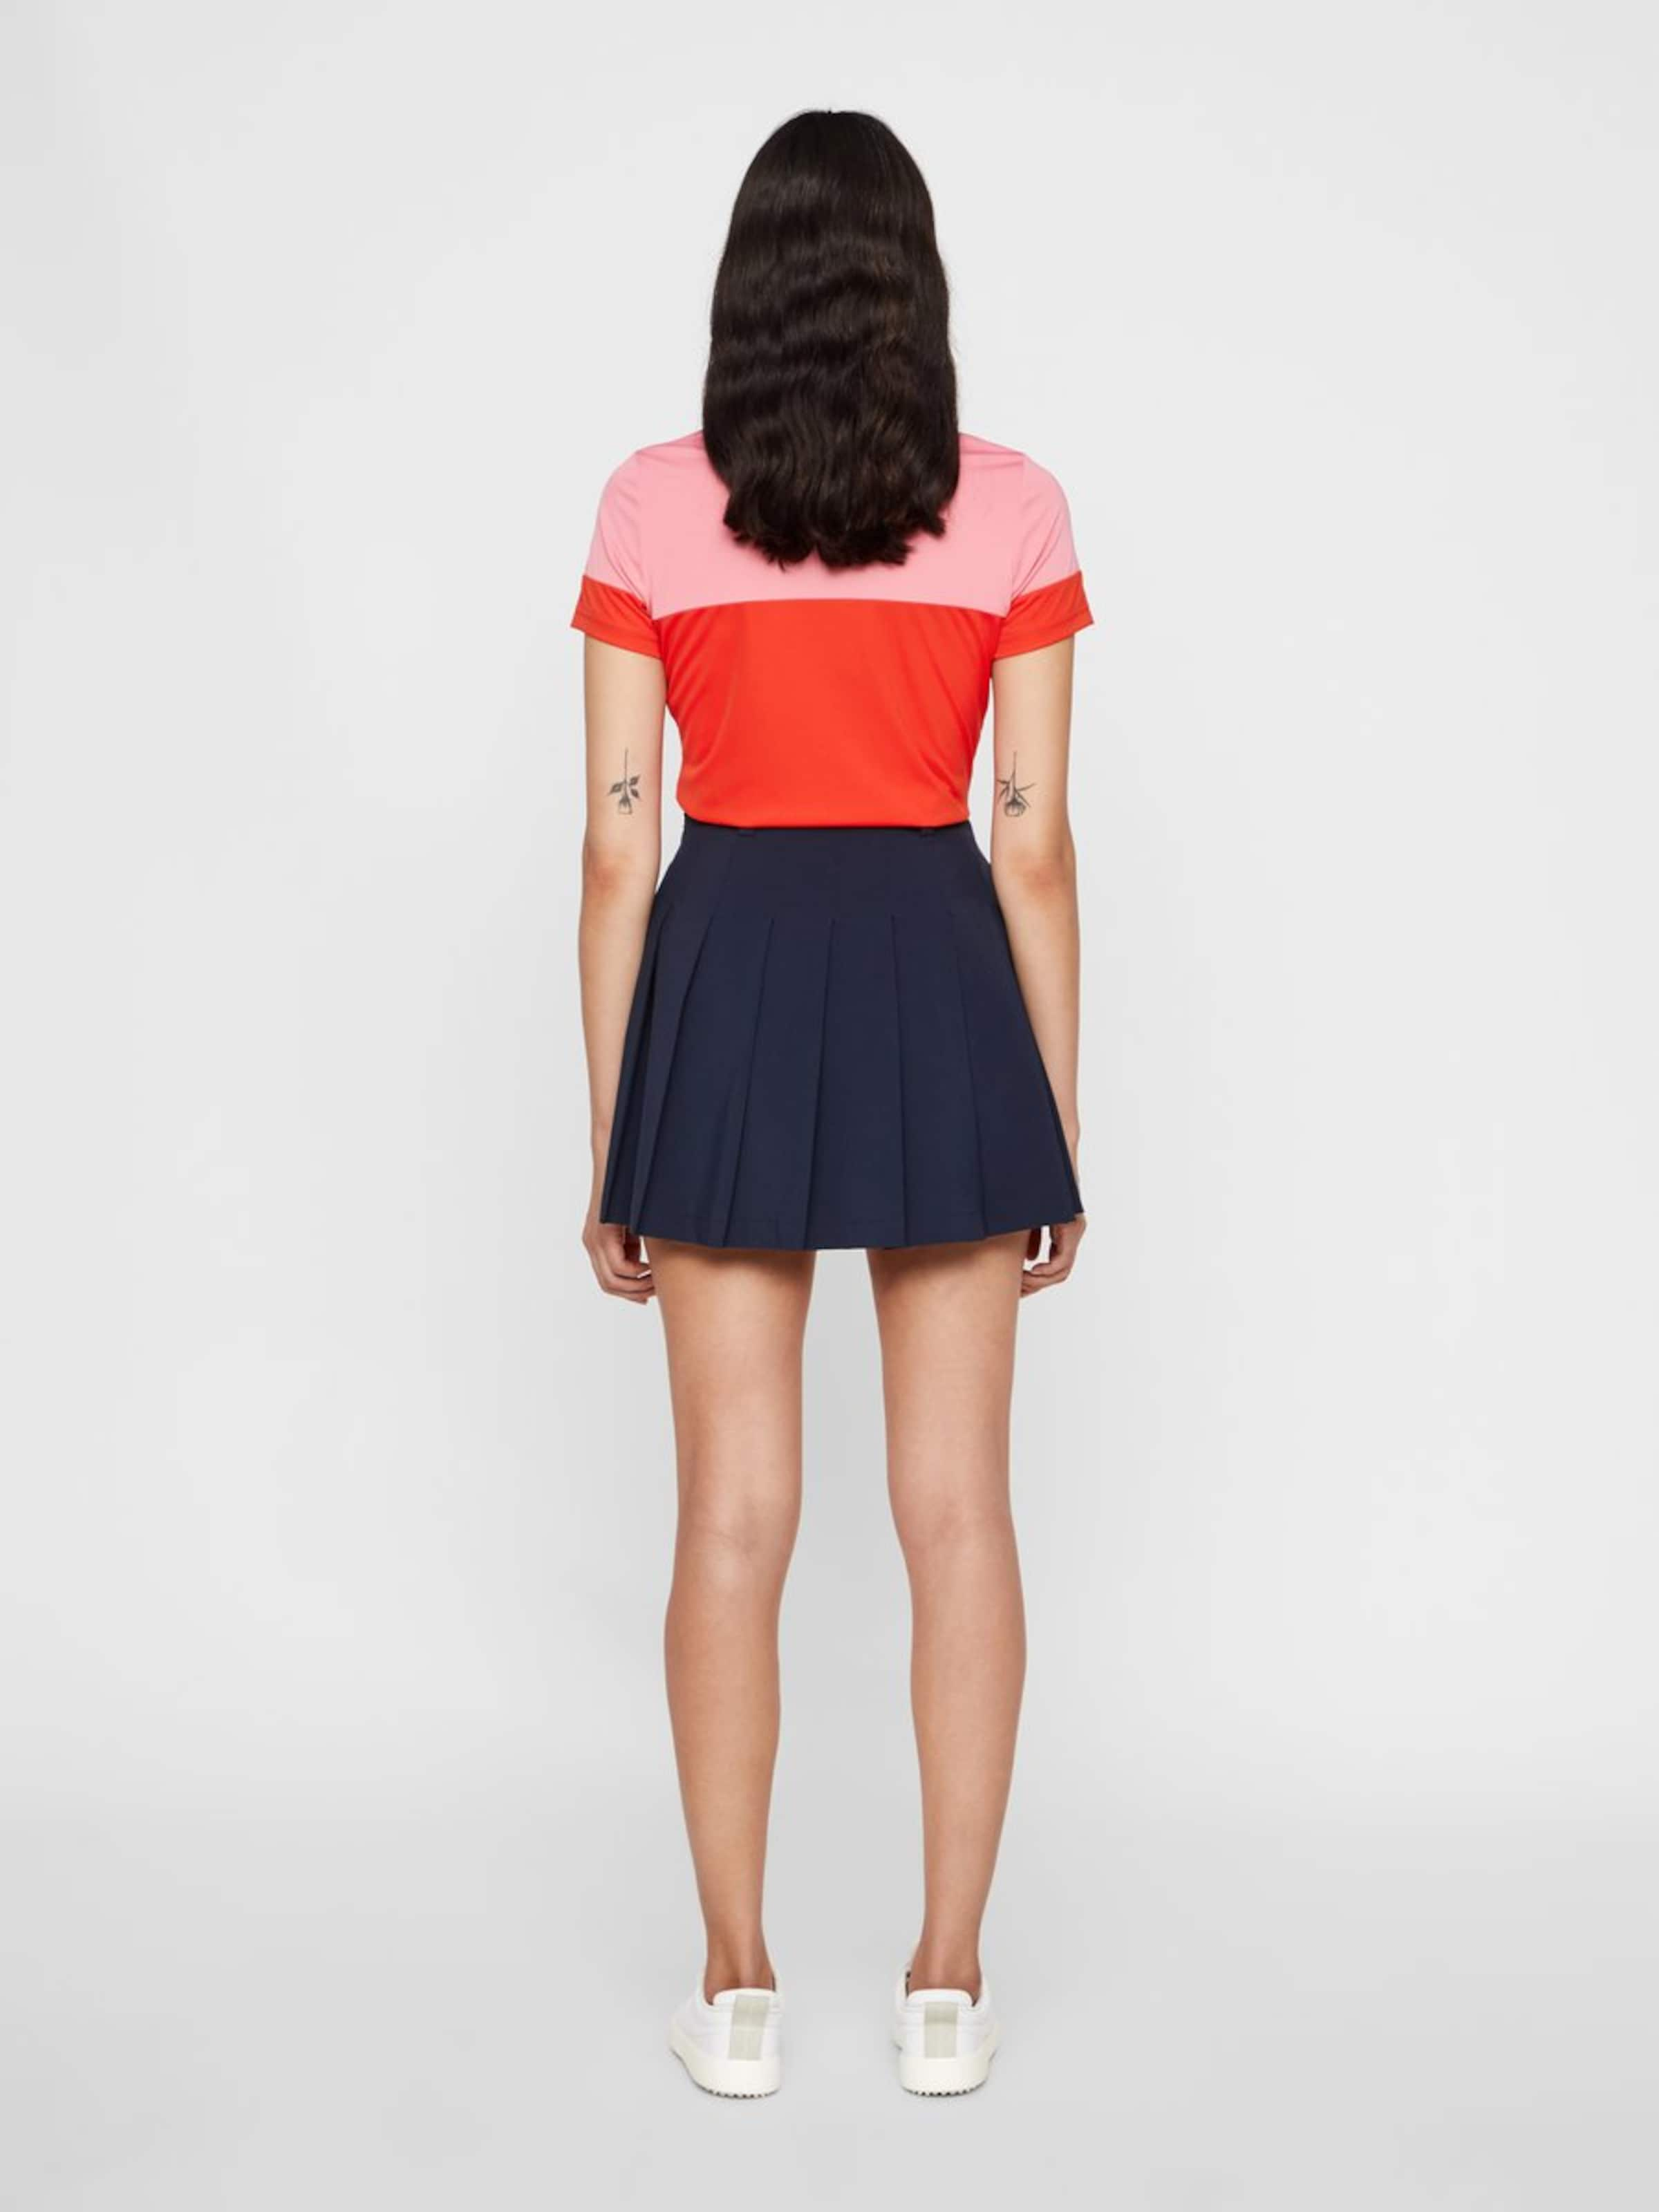 T En shirt Rouge J 'ditte' lindeberg kilwTXOuPZ